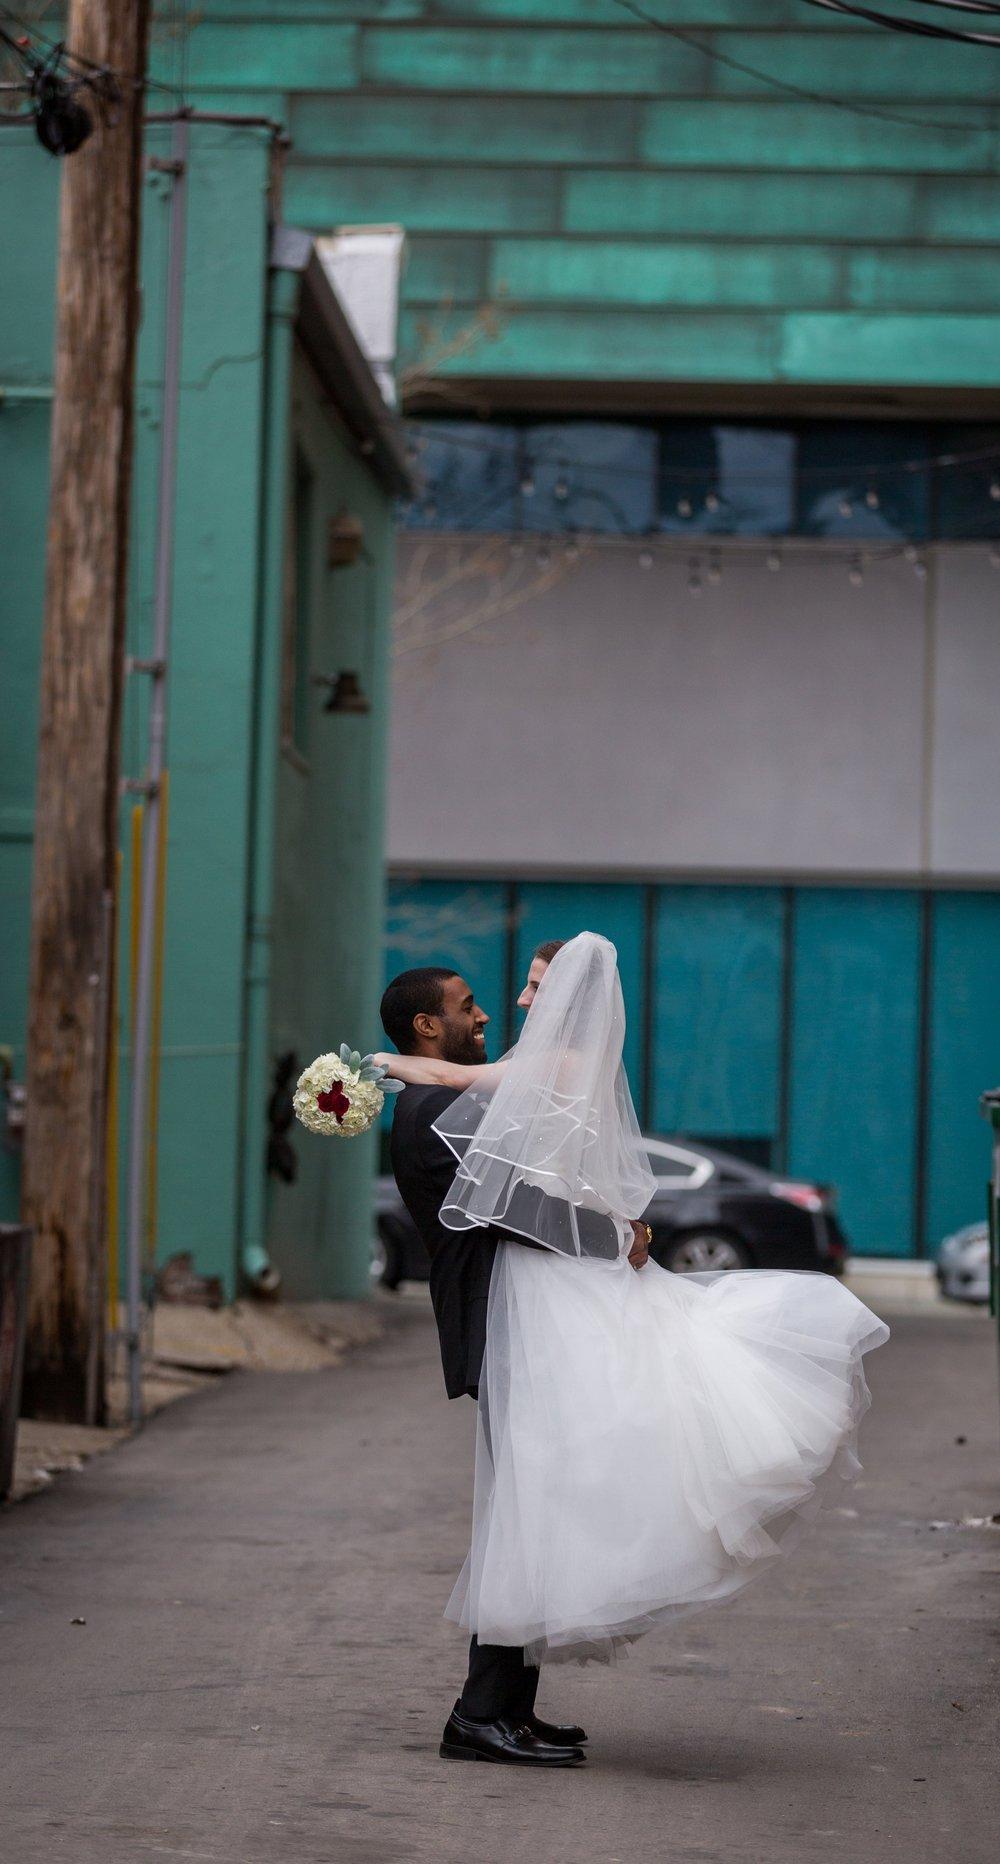 Kansas_City_Small_Wedding_Venue_Elope_Intimate_Ceremony_Budget_Affordable_15MinWedding-169.jpg